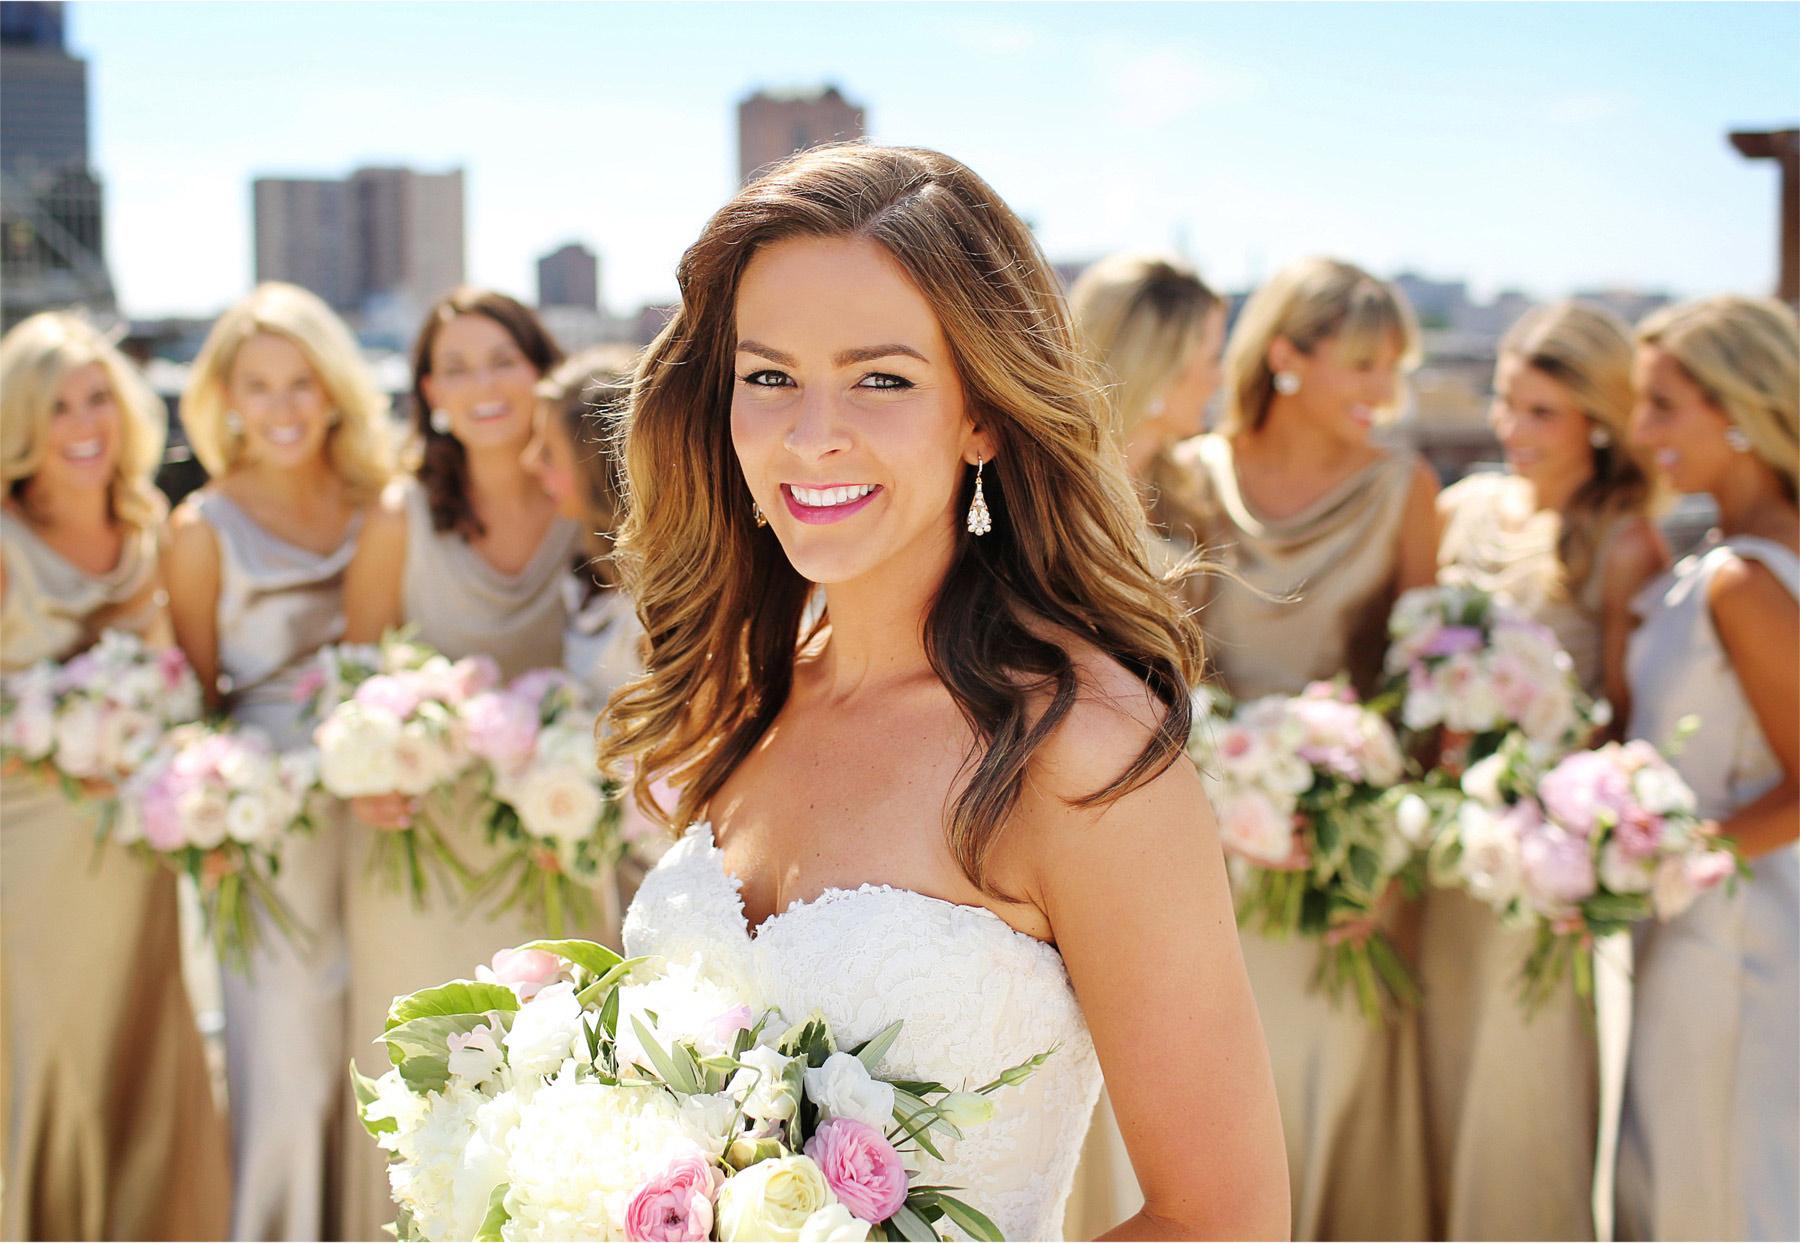 11-Saint-Paul-Minnesota-Wedding-Photographer-by-Andrew-Vick-Photography-Summer-Bride-Bridesmaids-Flowers-Molly-and-Dan.jpg